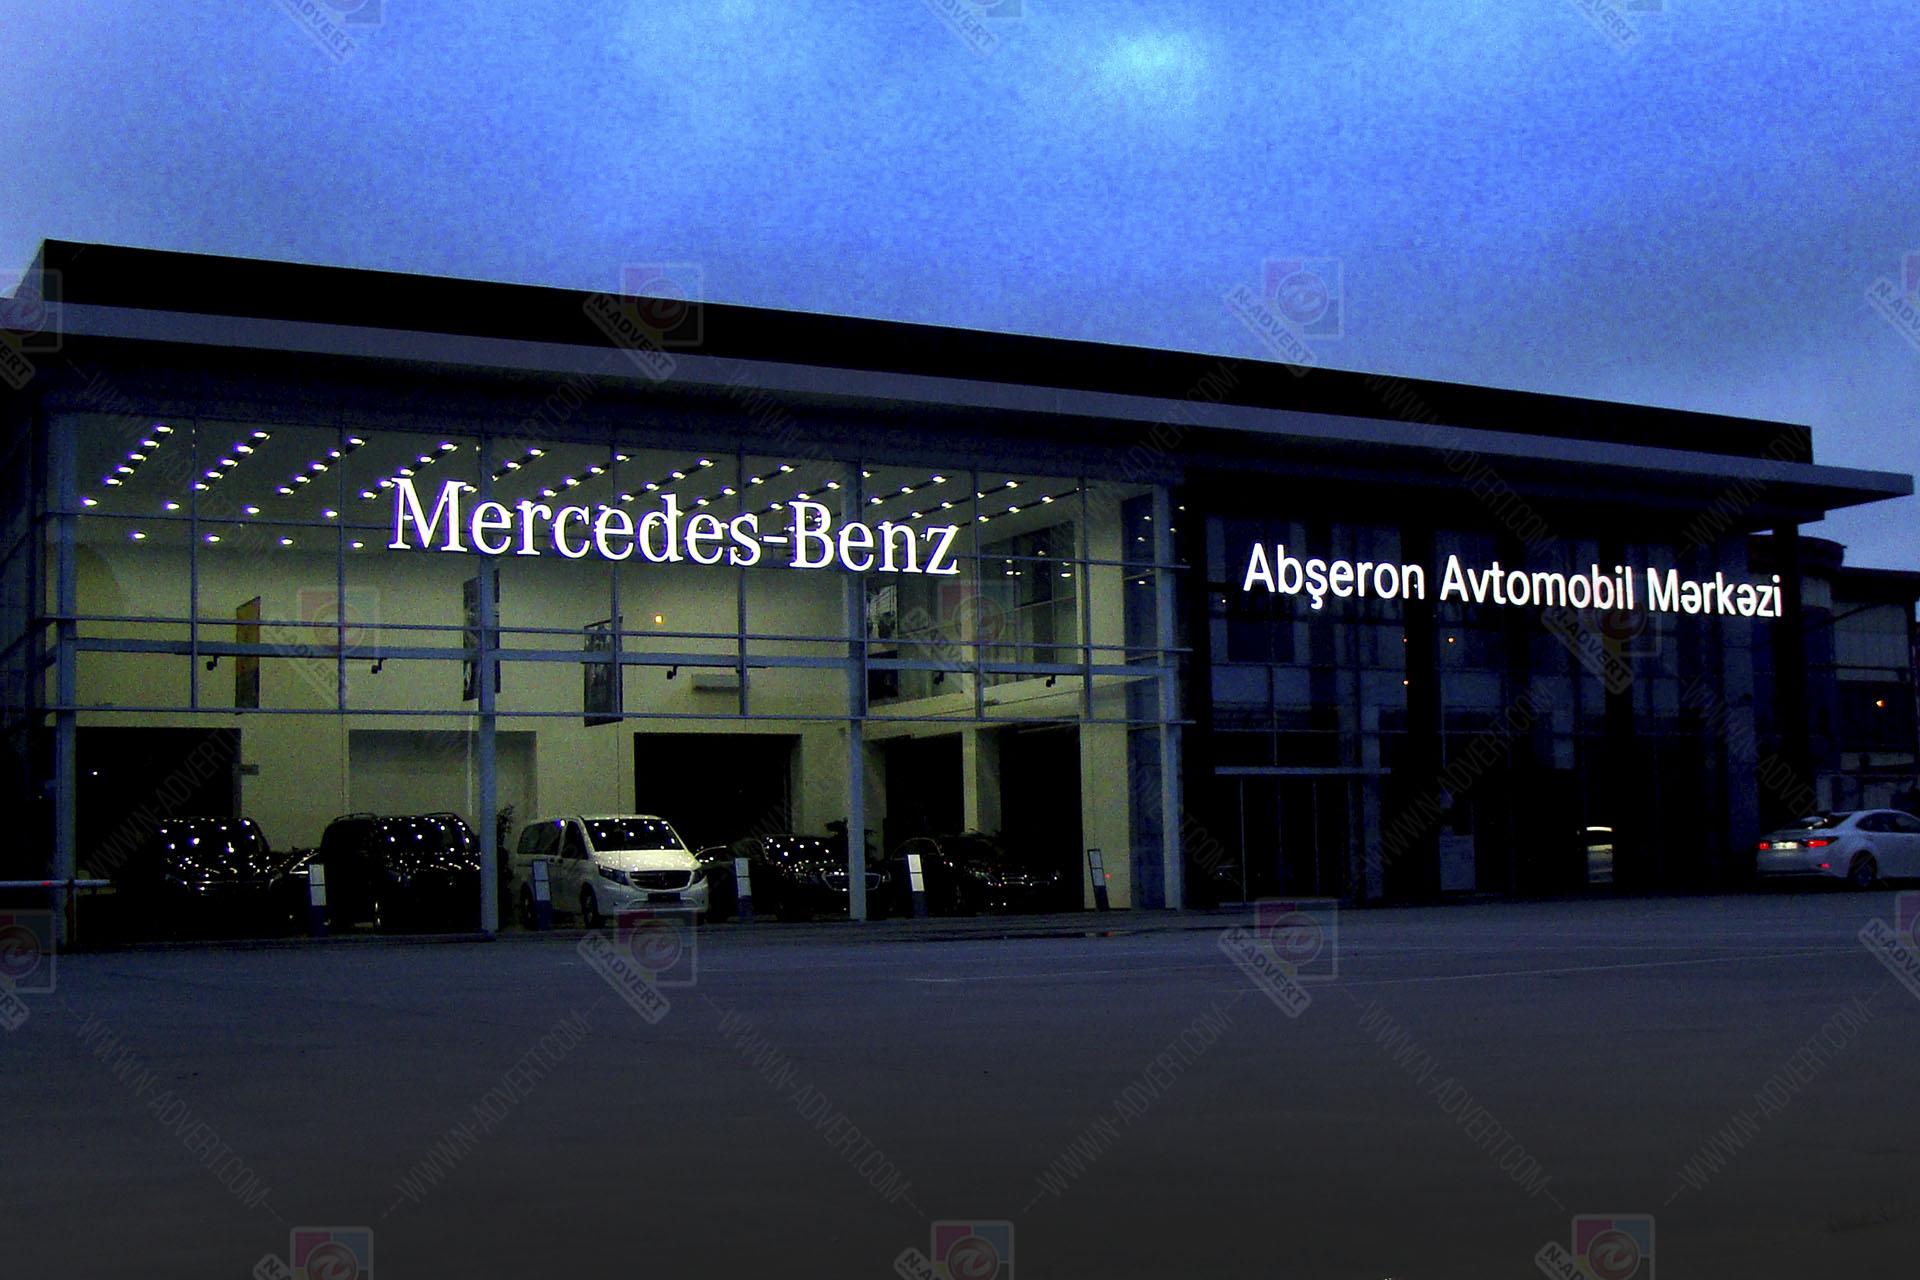 Mercedes Benz 1920x1280